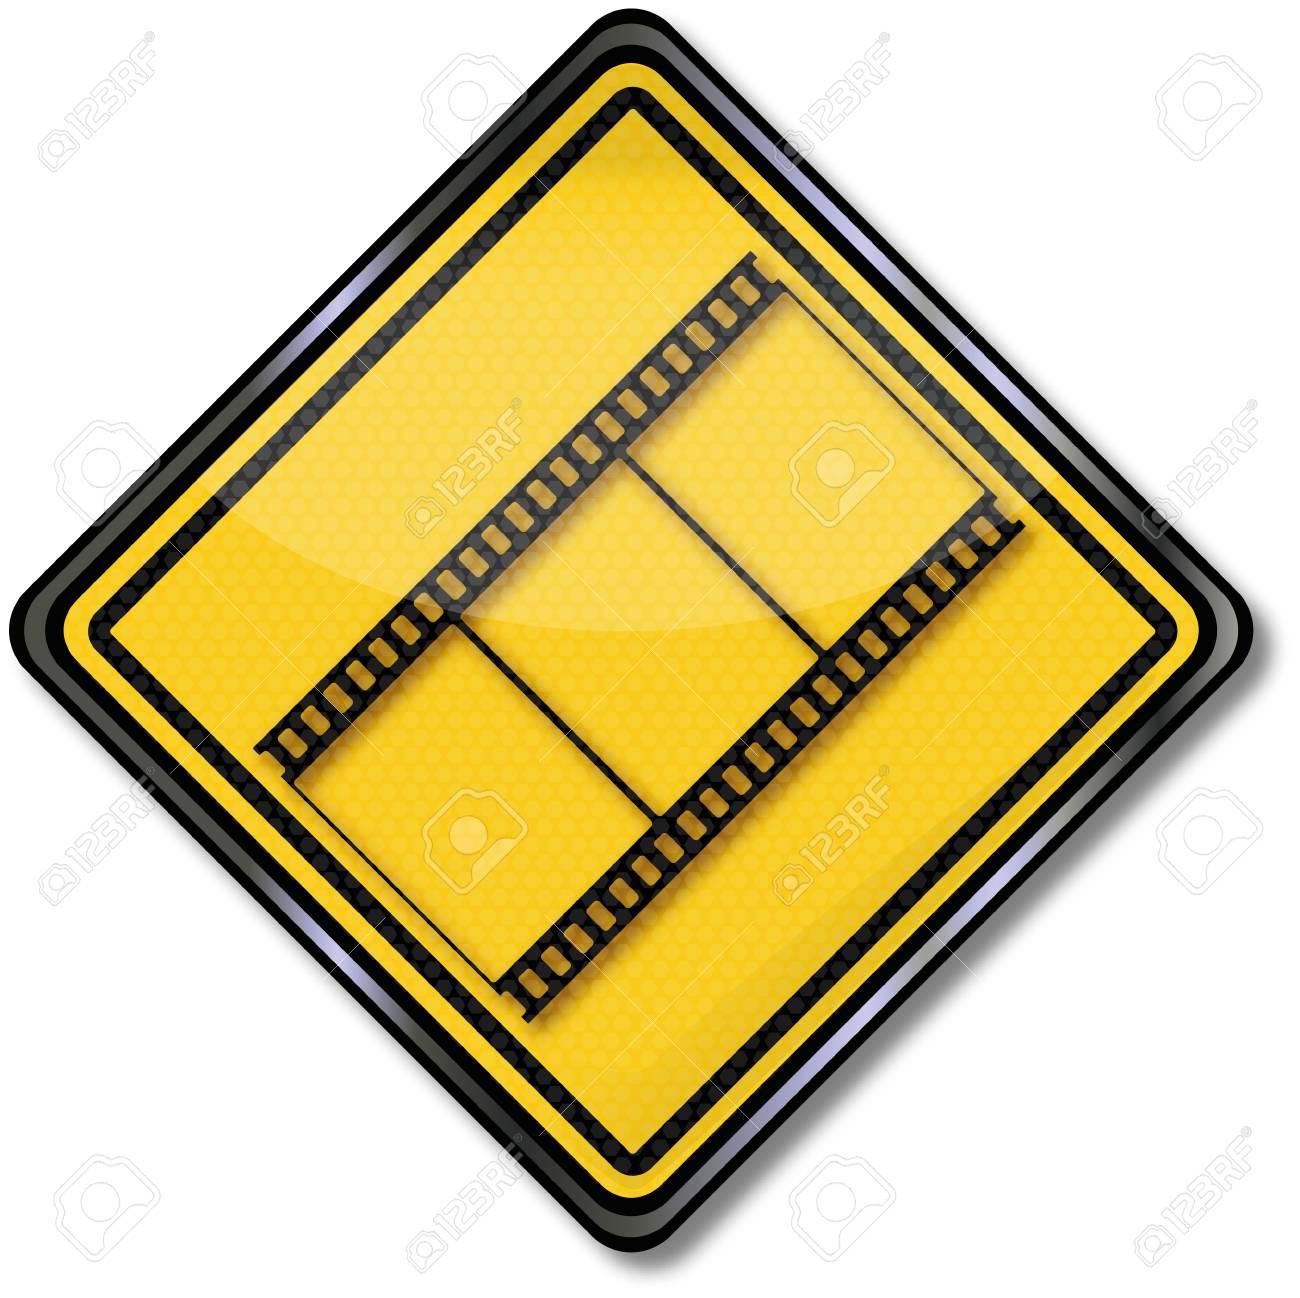 Shield Film Stock Vector - 14981938